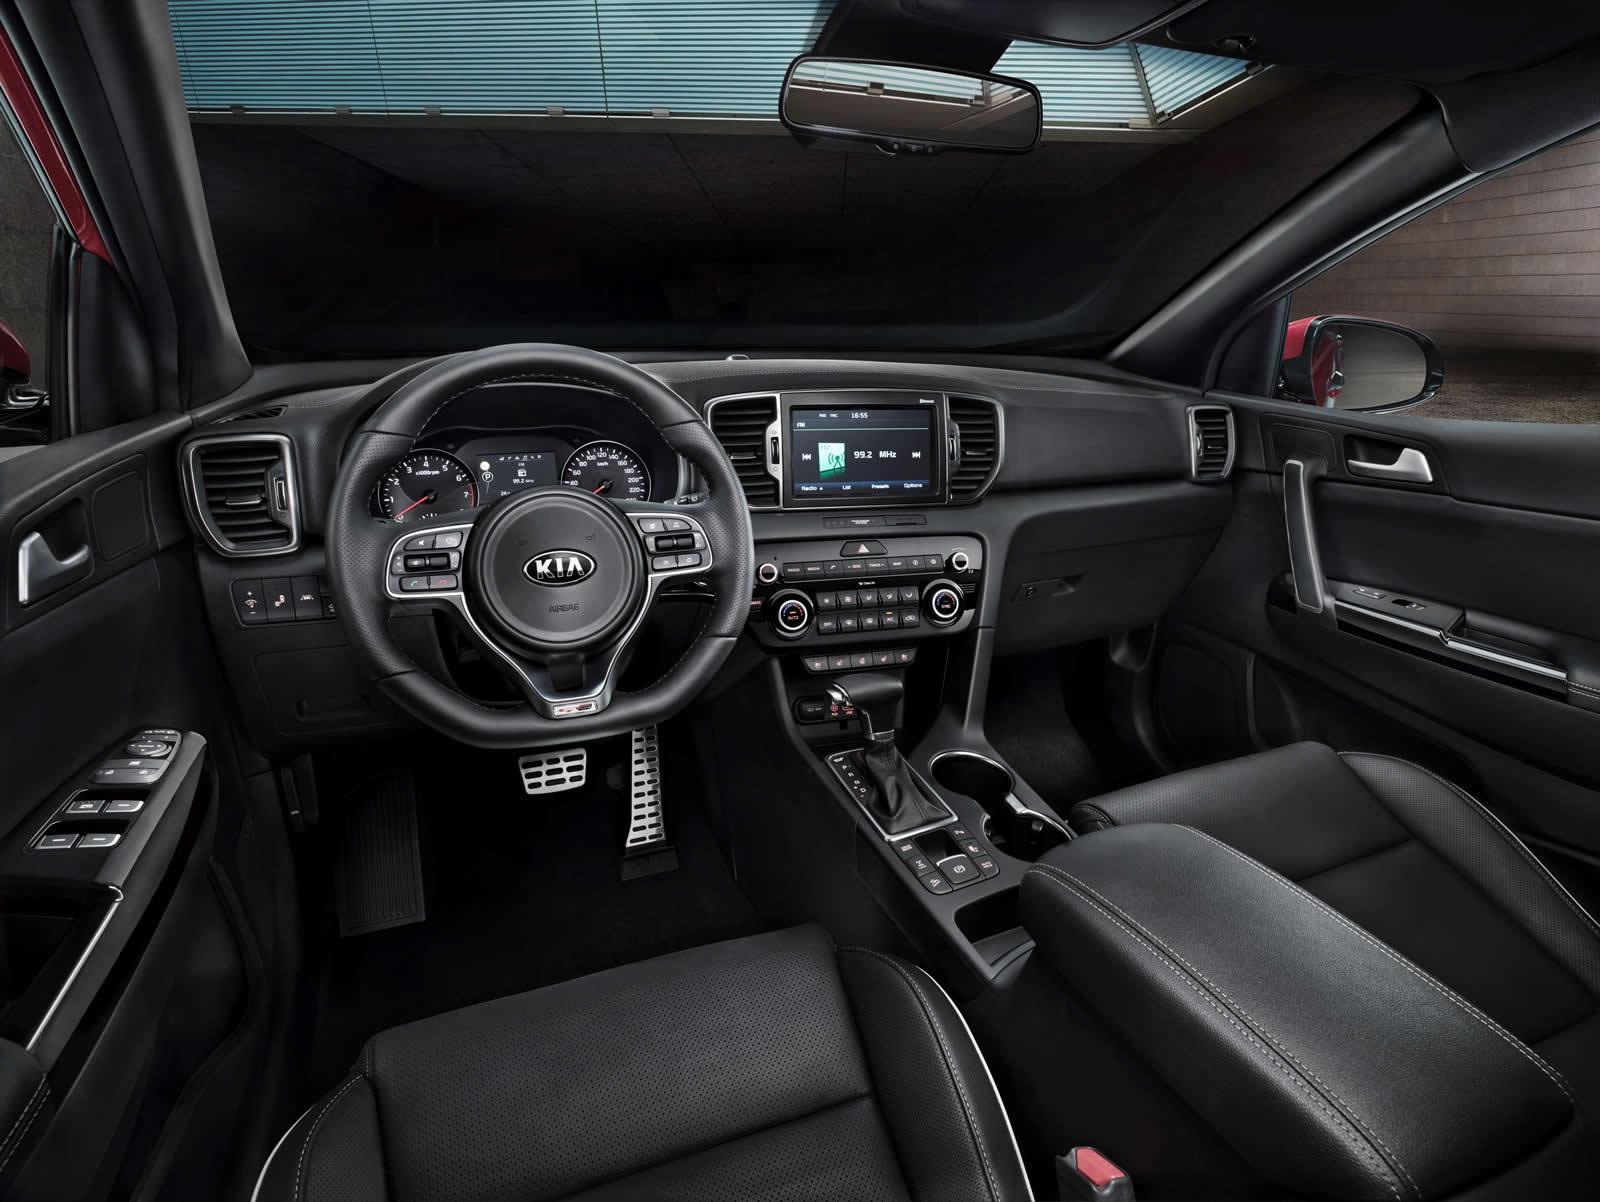 2016 Kia Sportage interior press shots